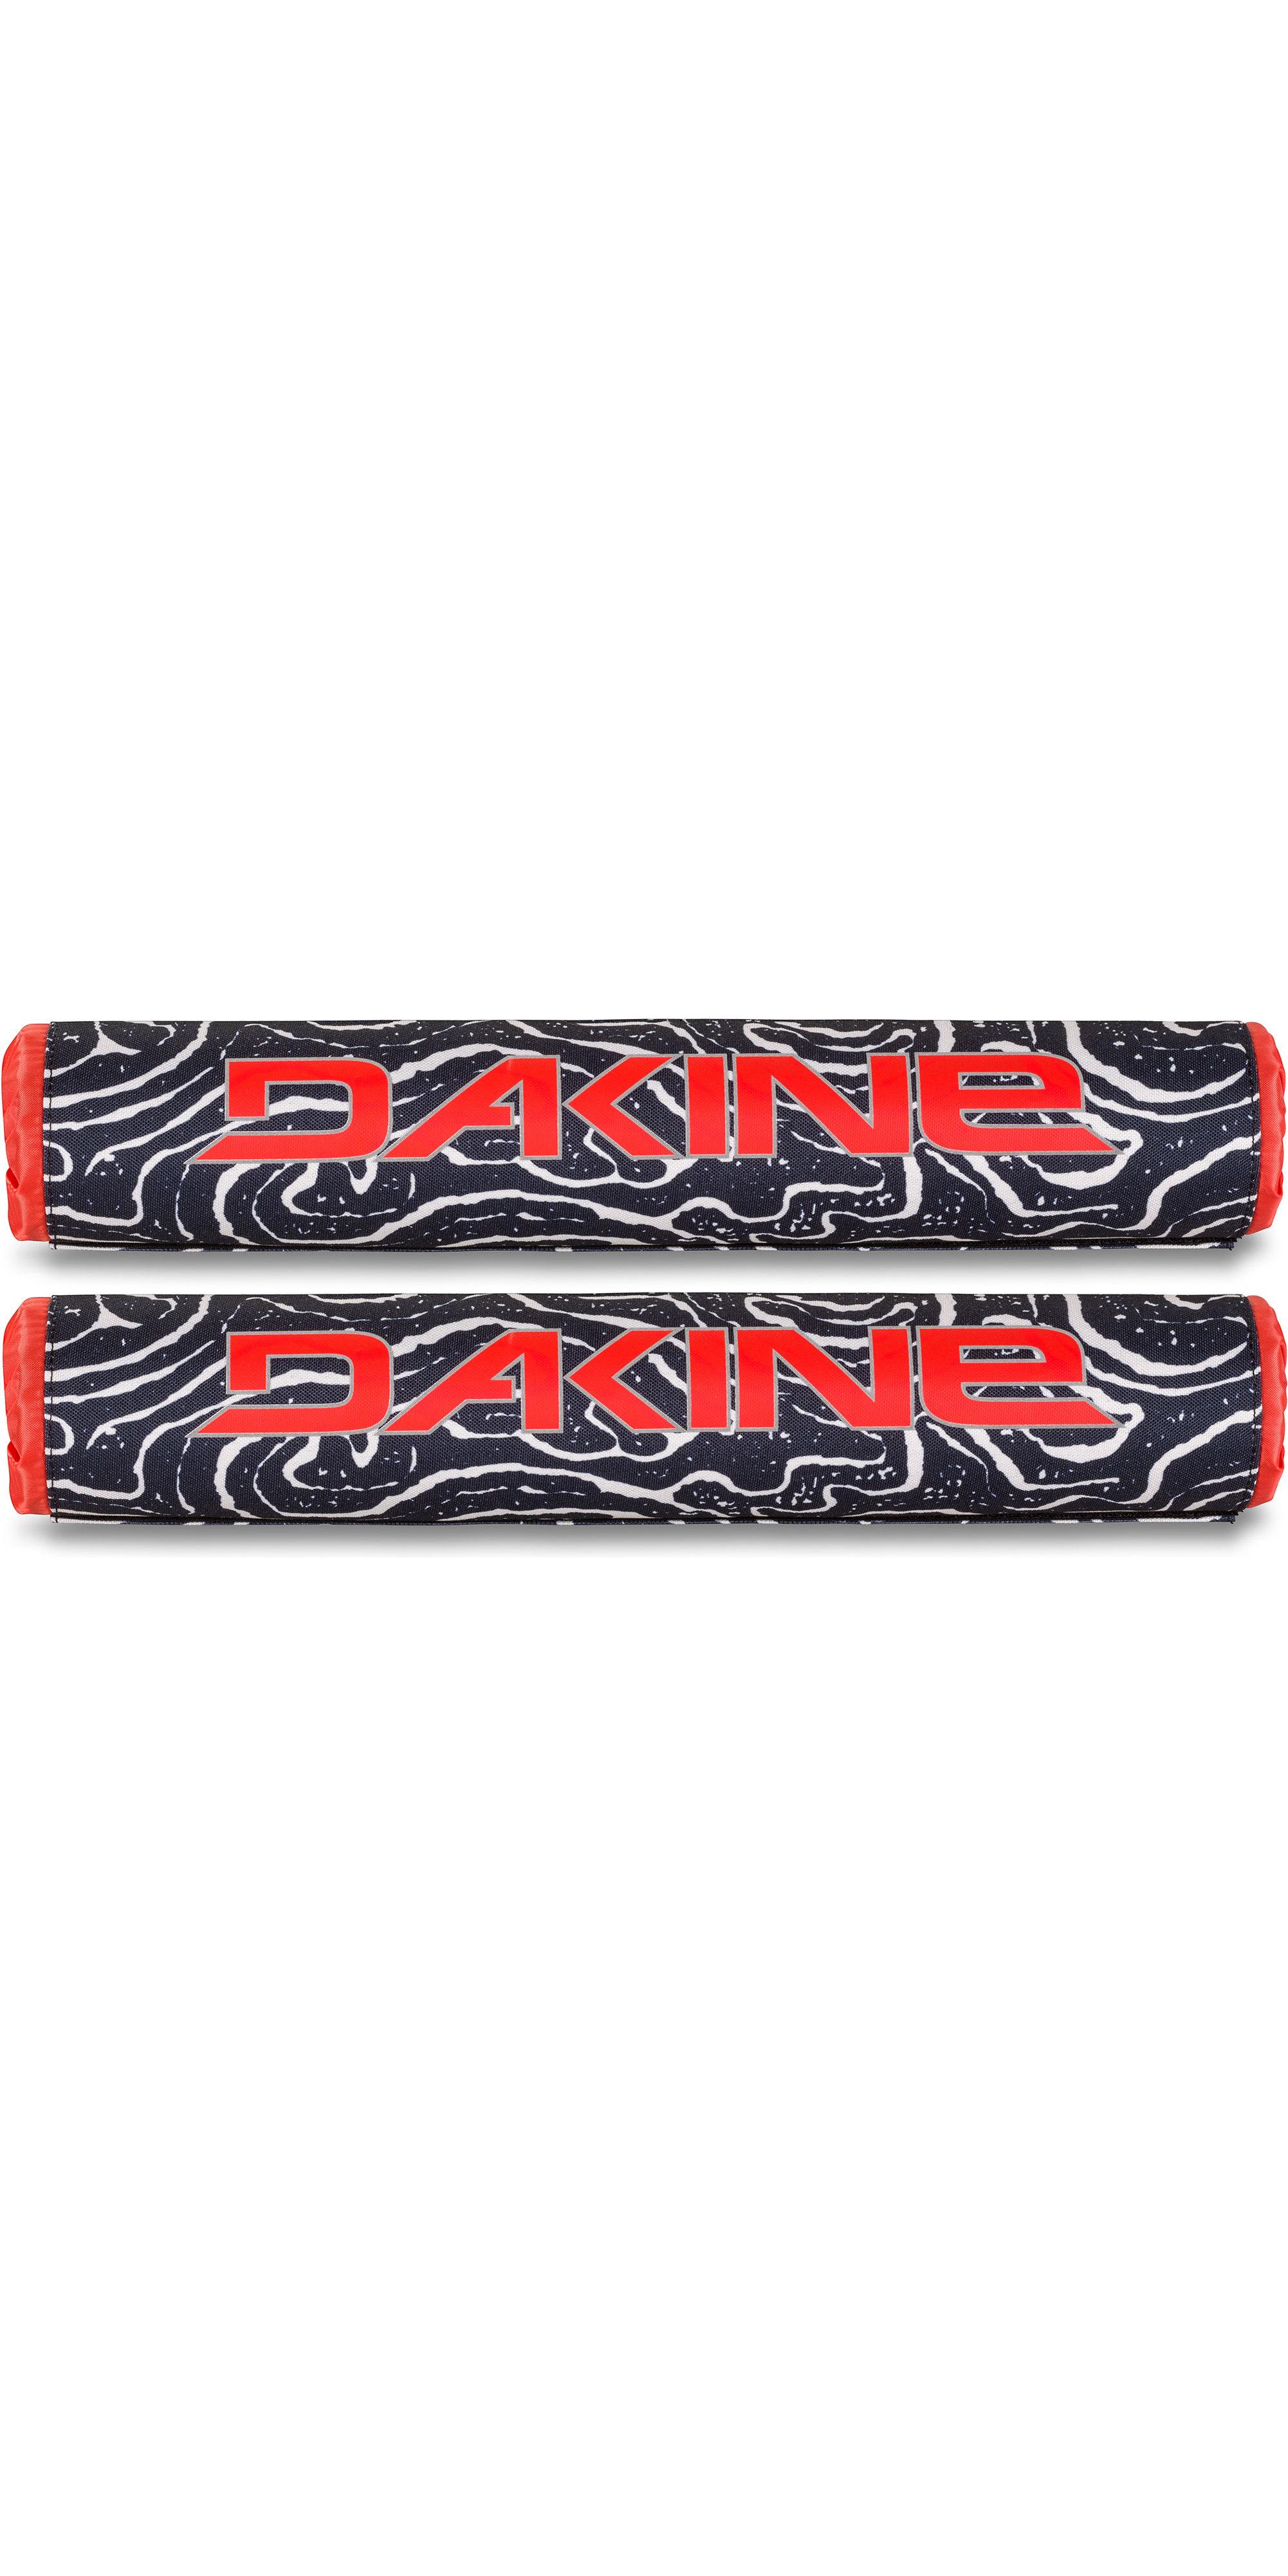 2019 Dakine Roof Rack Pads 43cm Lavatubes 8840310